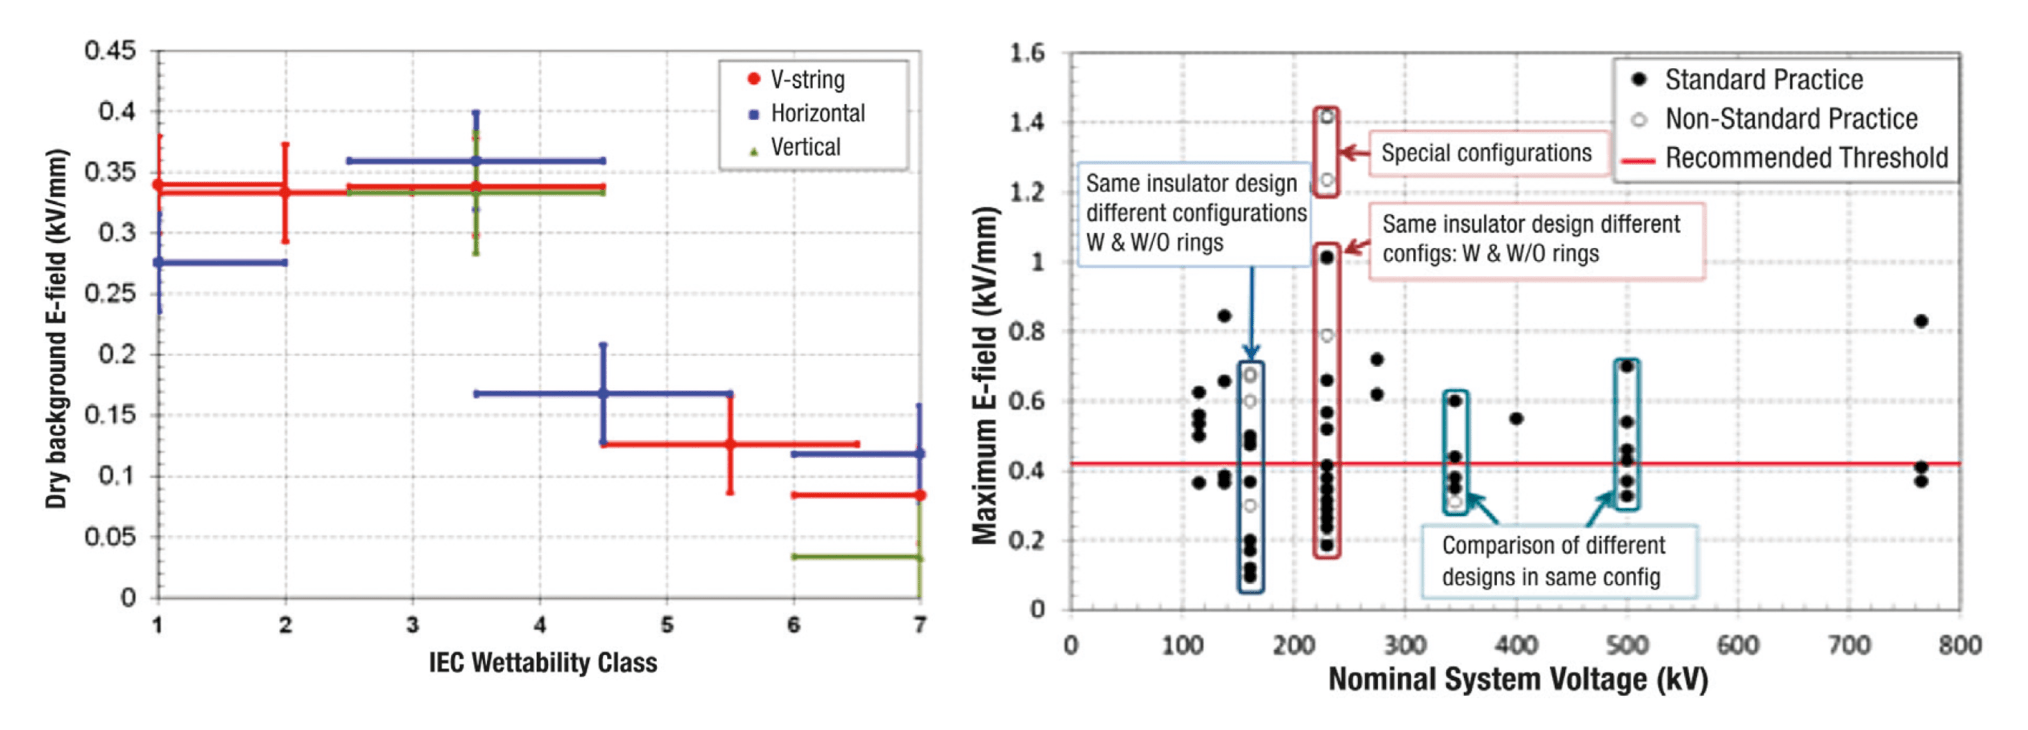 composite insulator Optimal Dimensioning of Grading Rings for Composite Insulators inmr 1